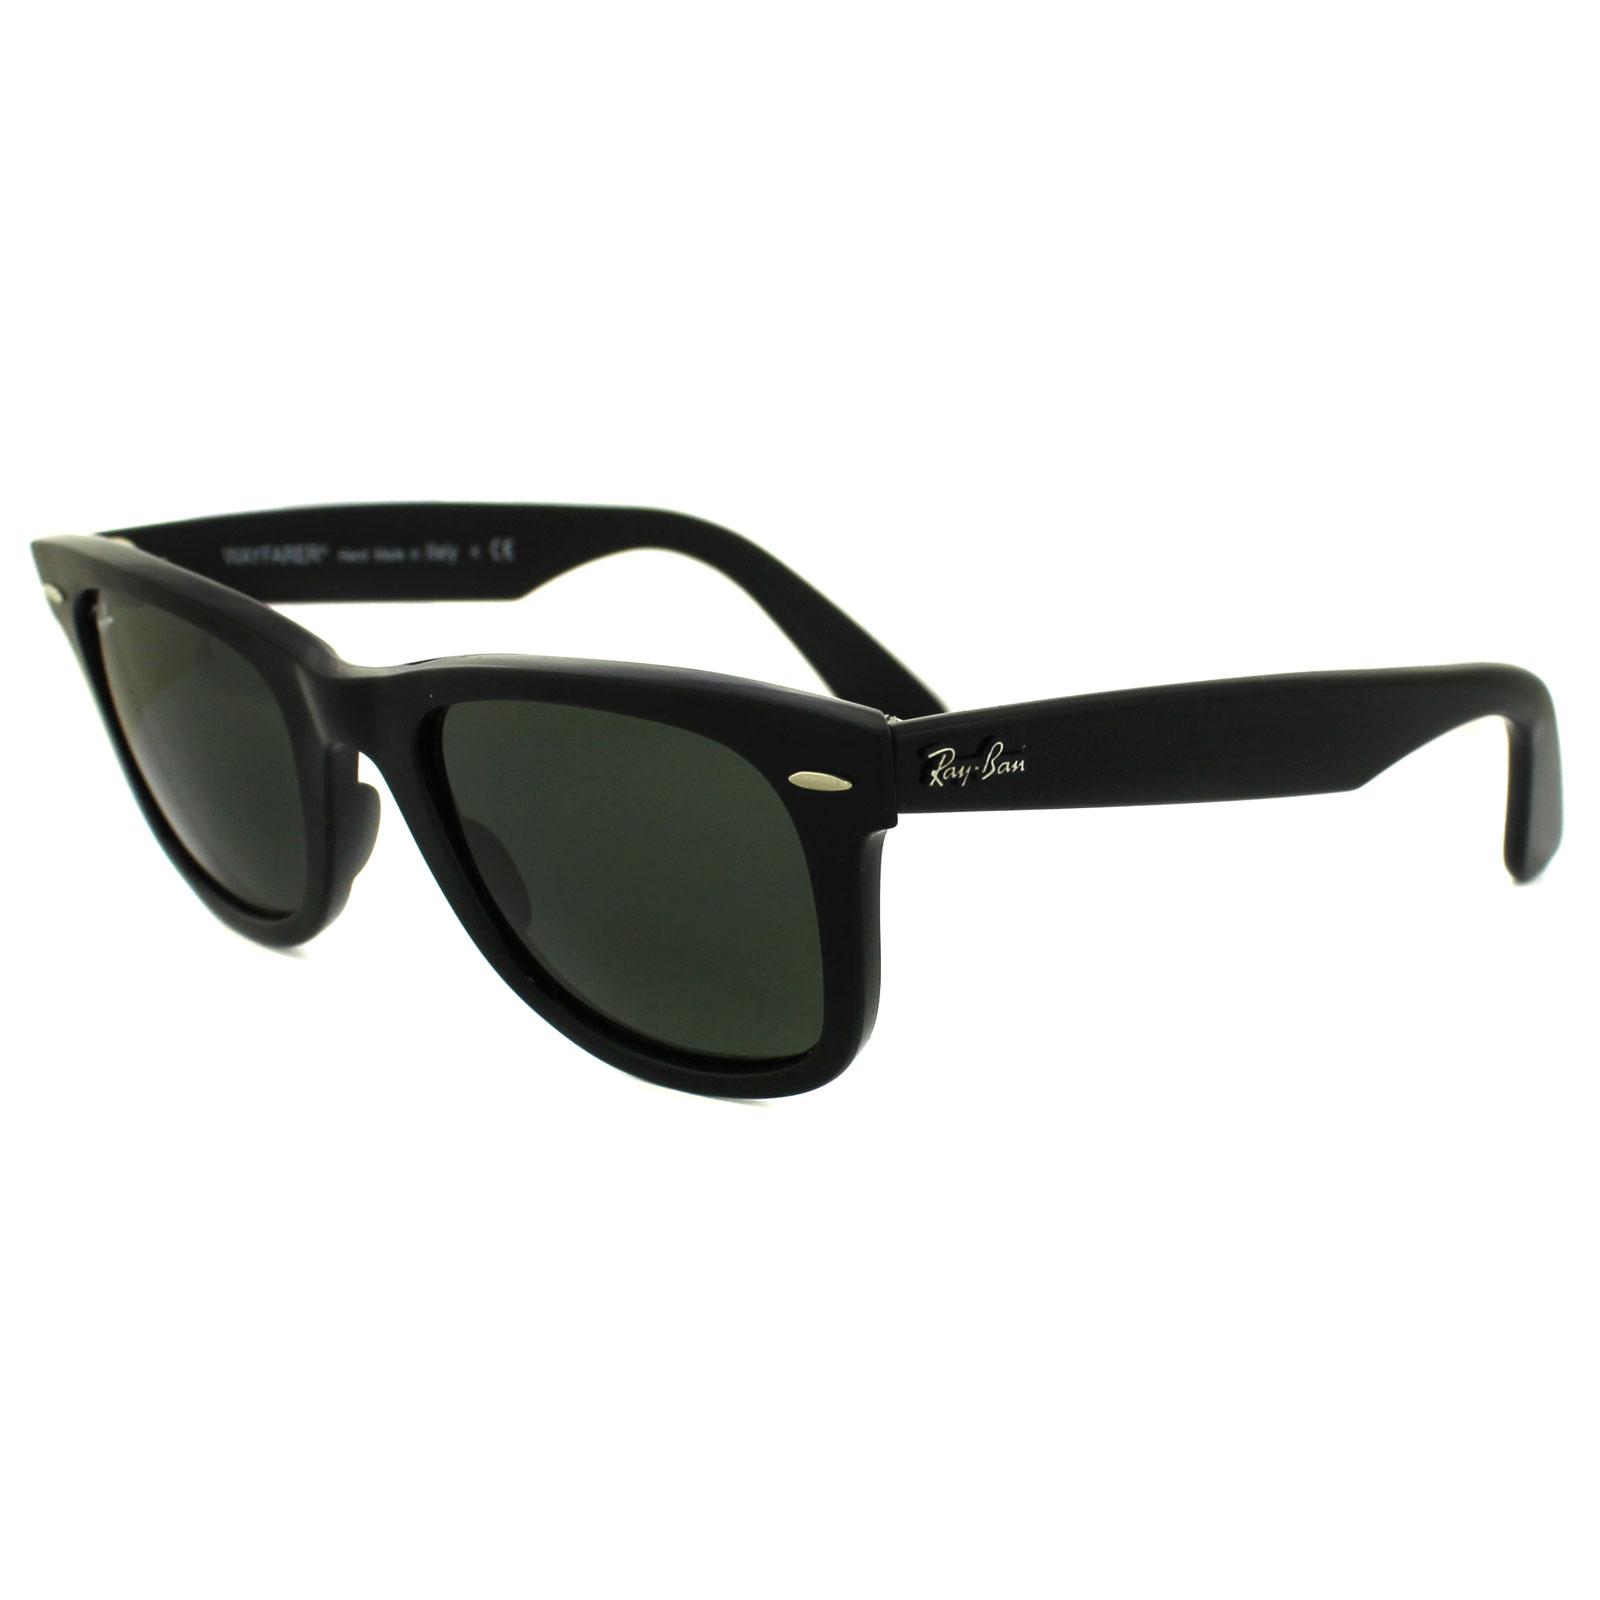 gafas de sol ray ban 2140